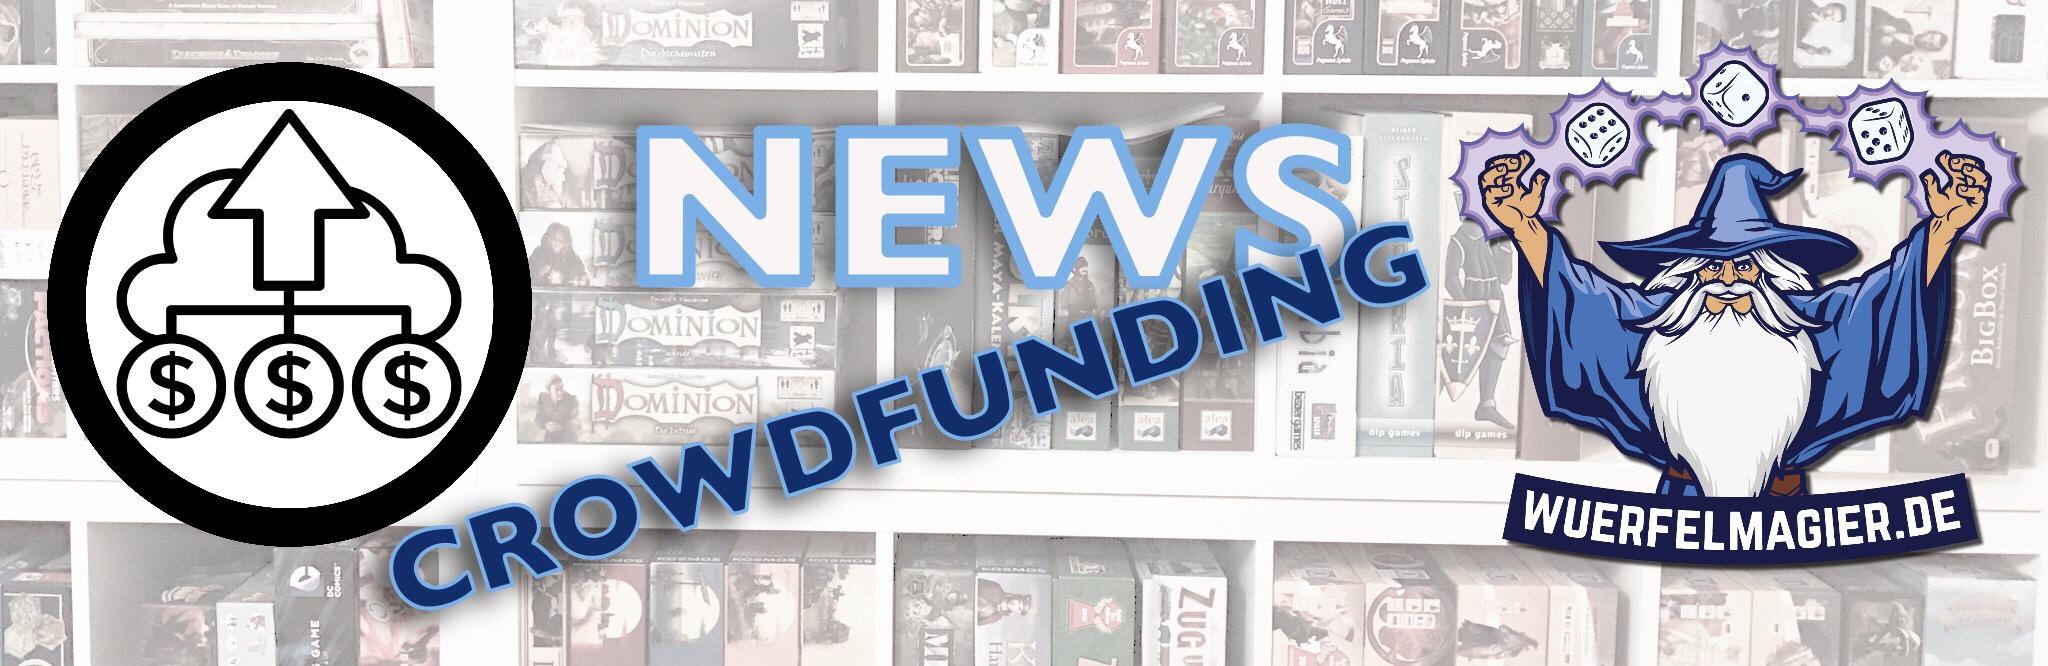 News Crowdfunding